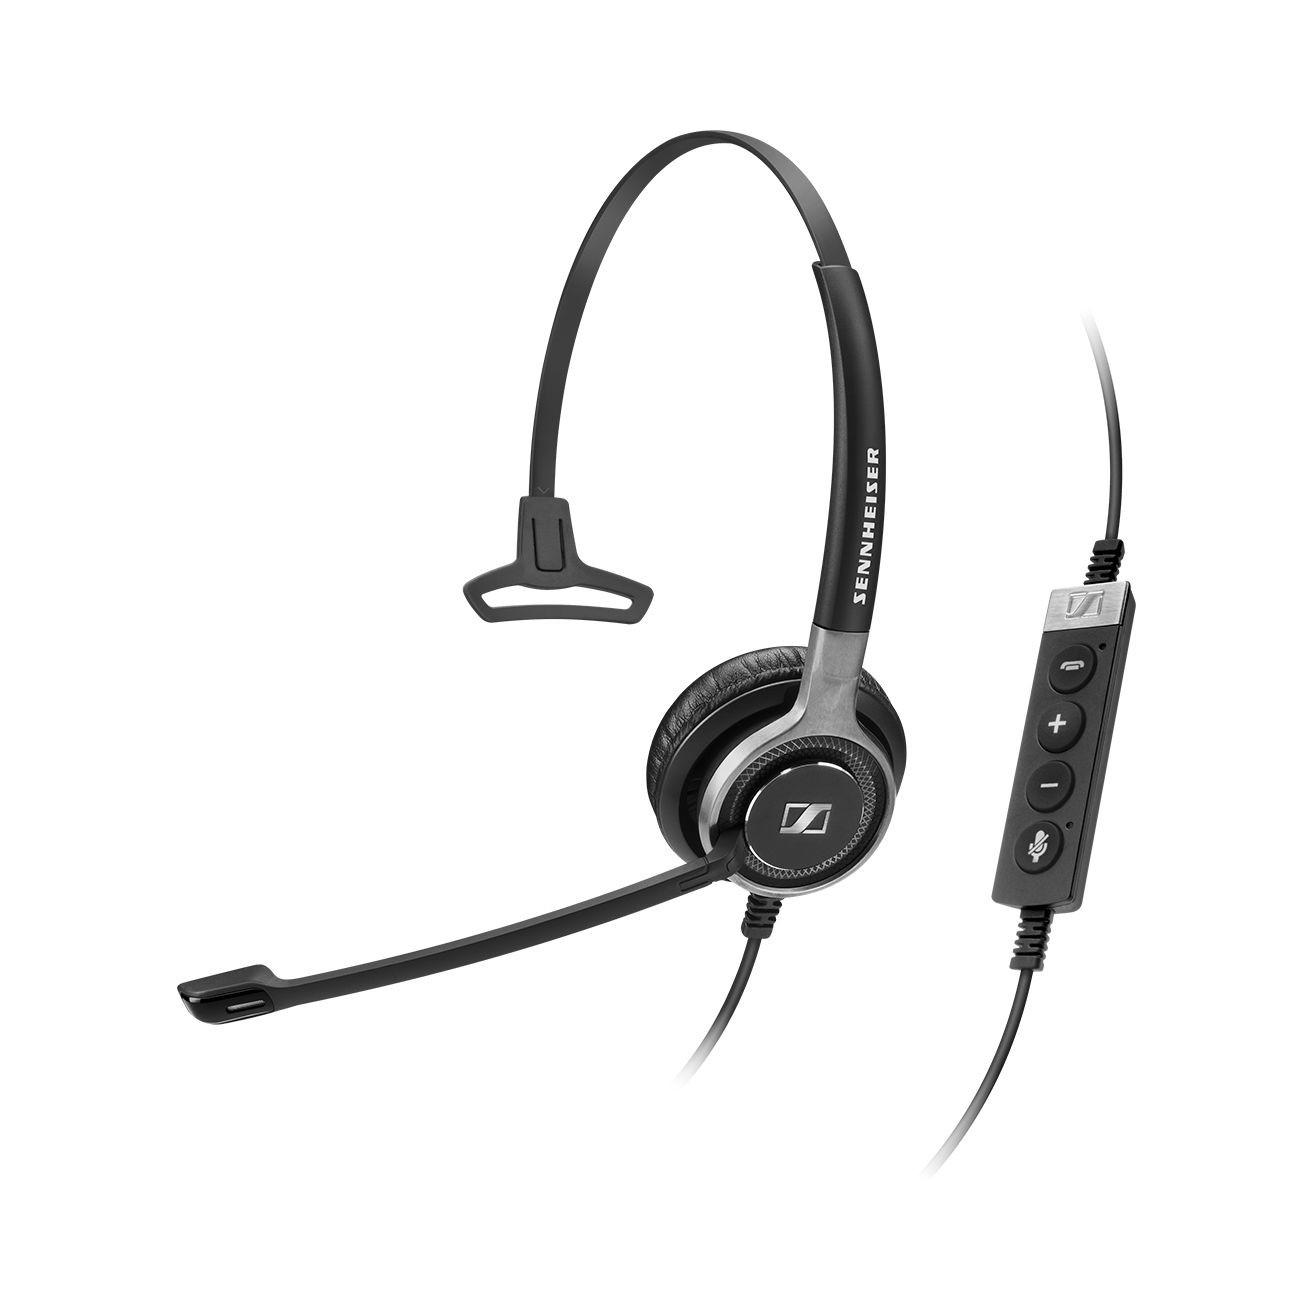 Sennheiser Century SC630 Monaural USB Ctrl Ms Lync Headset